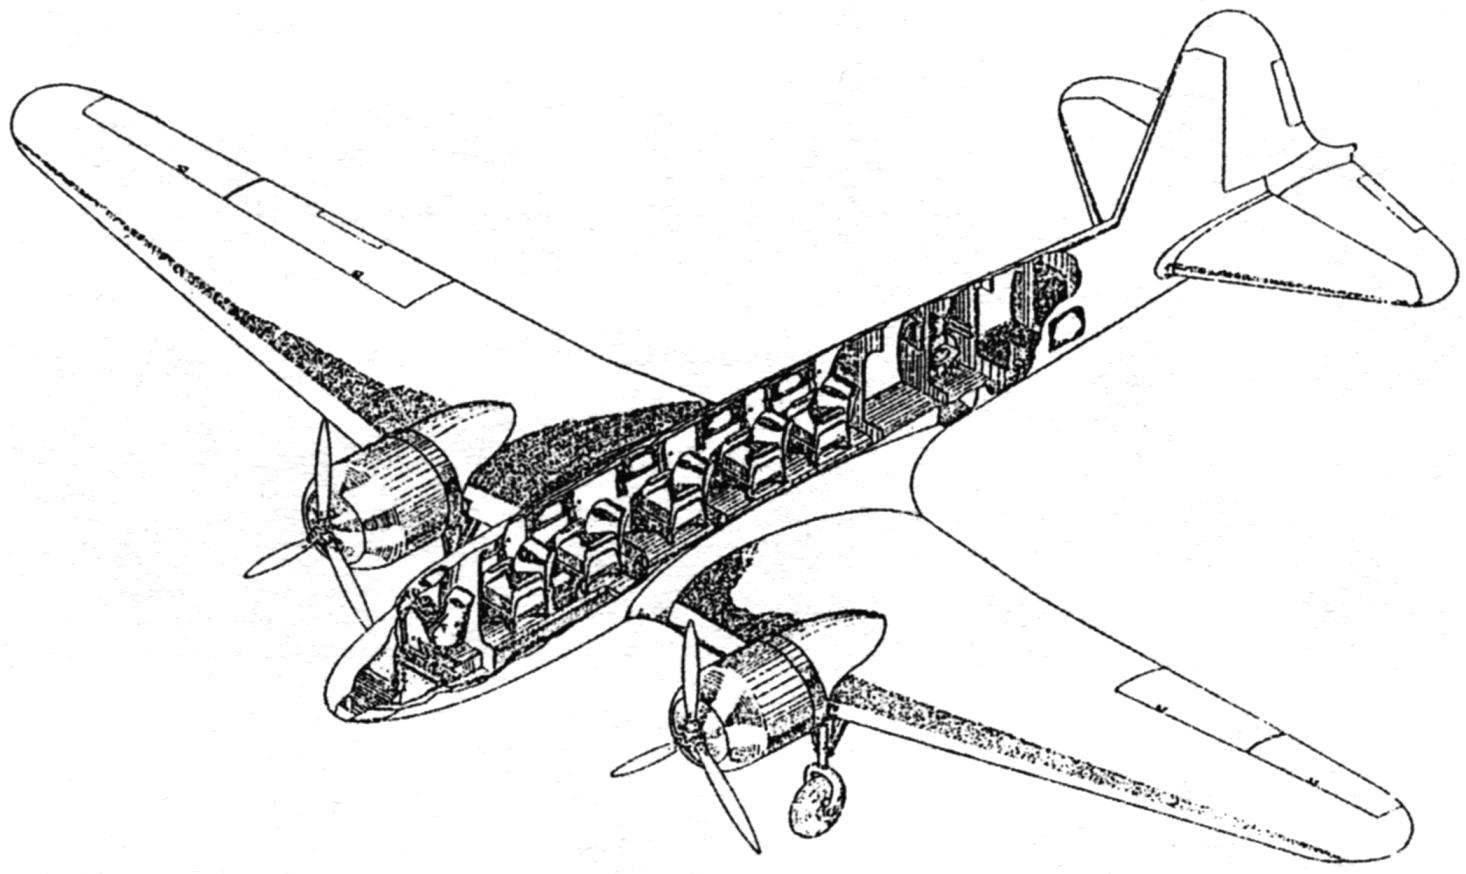 Компоновка ПС-35